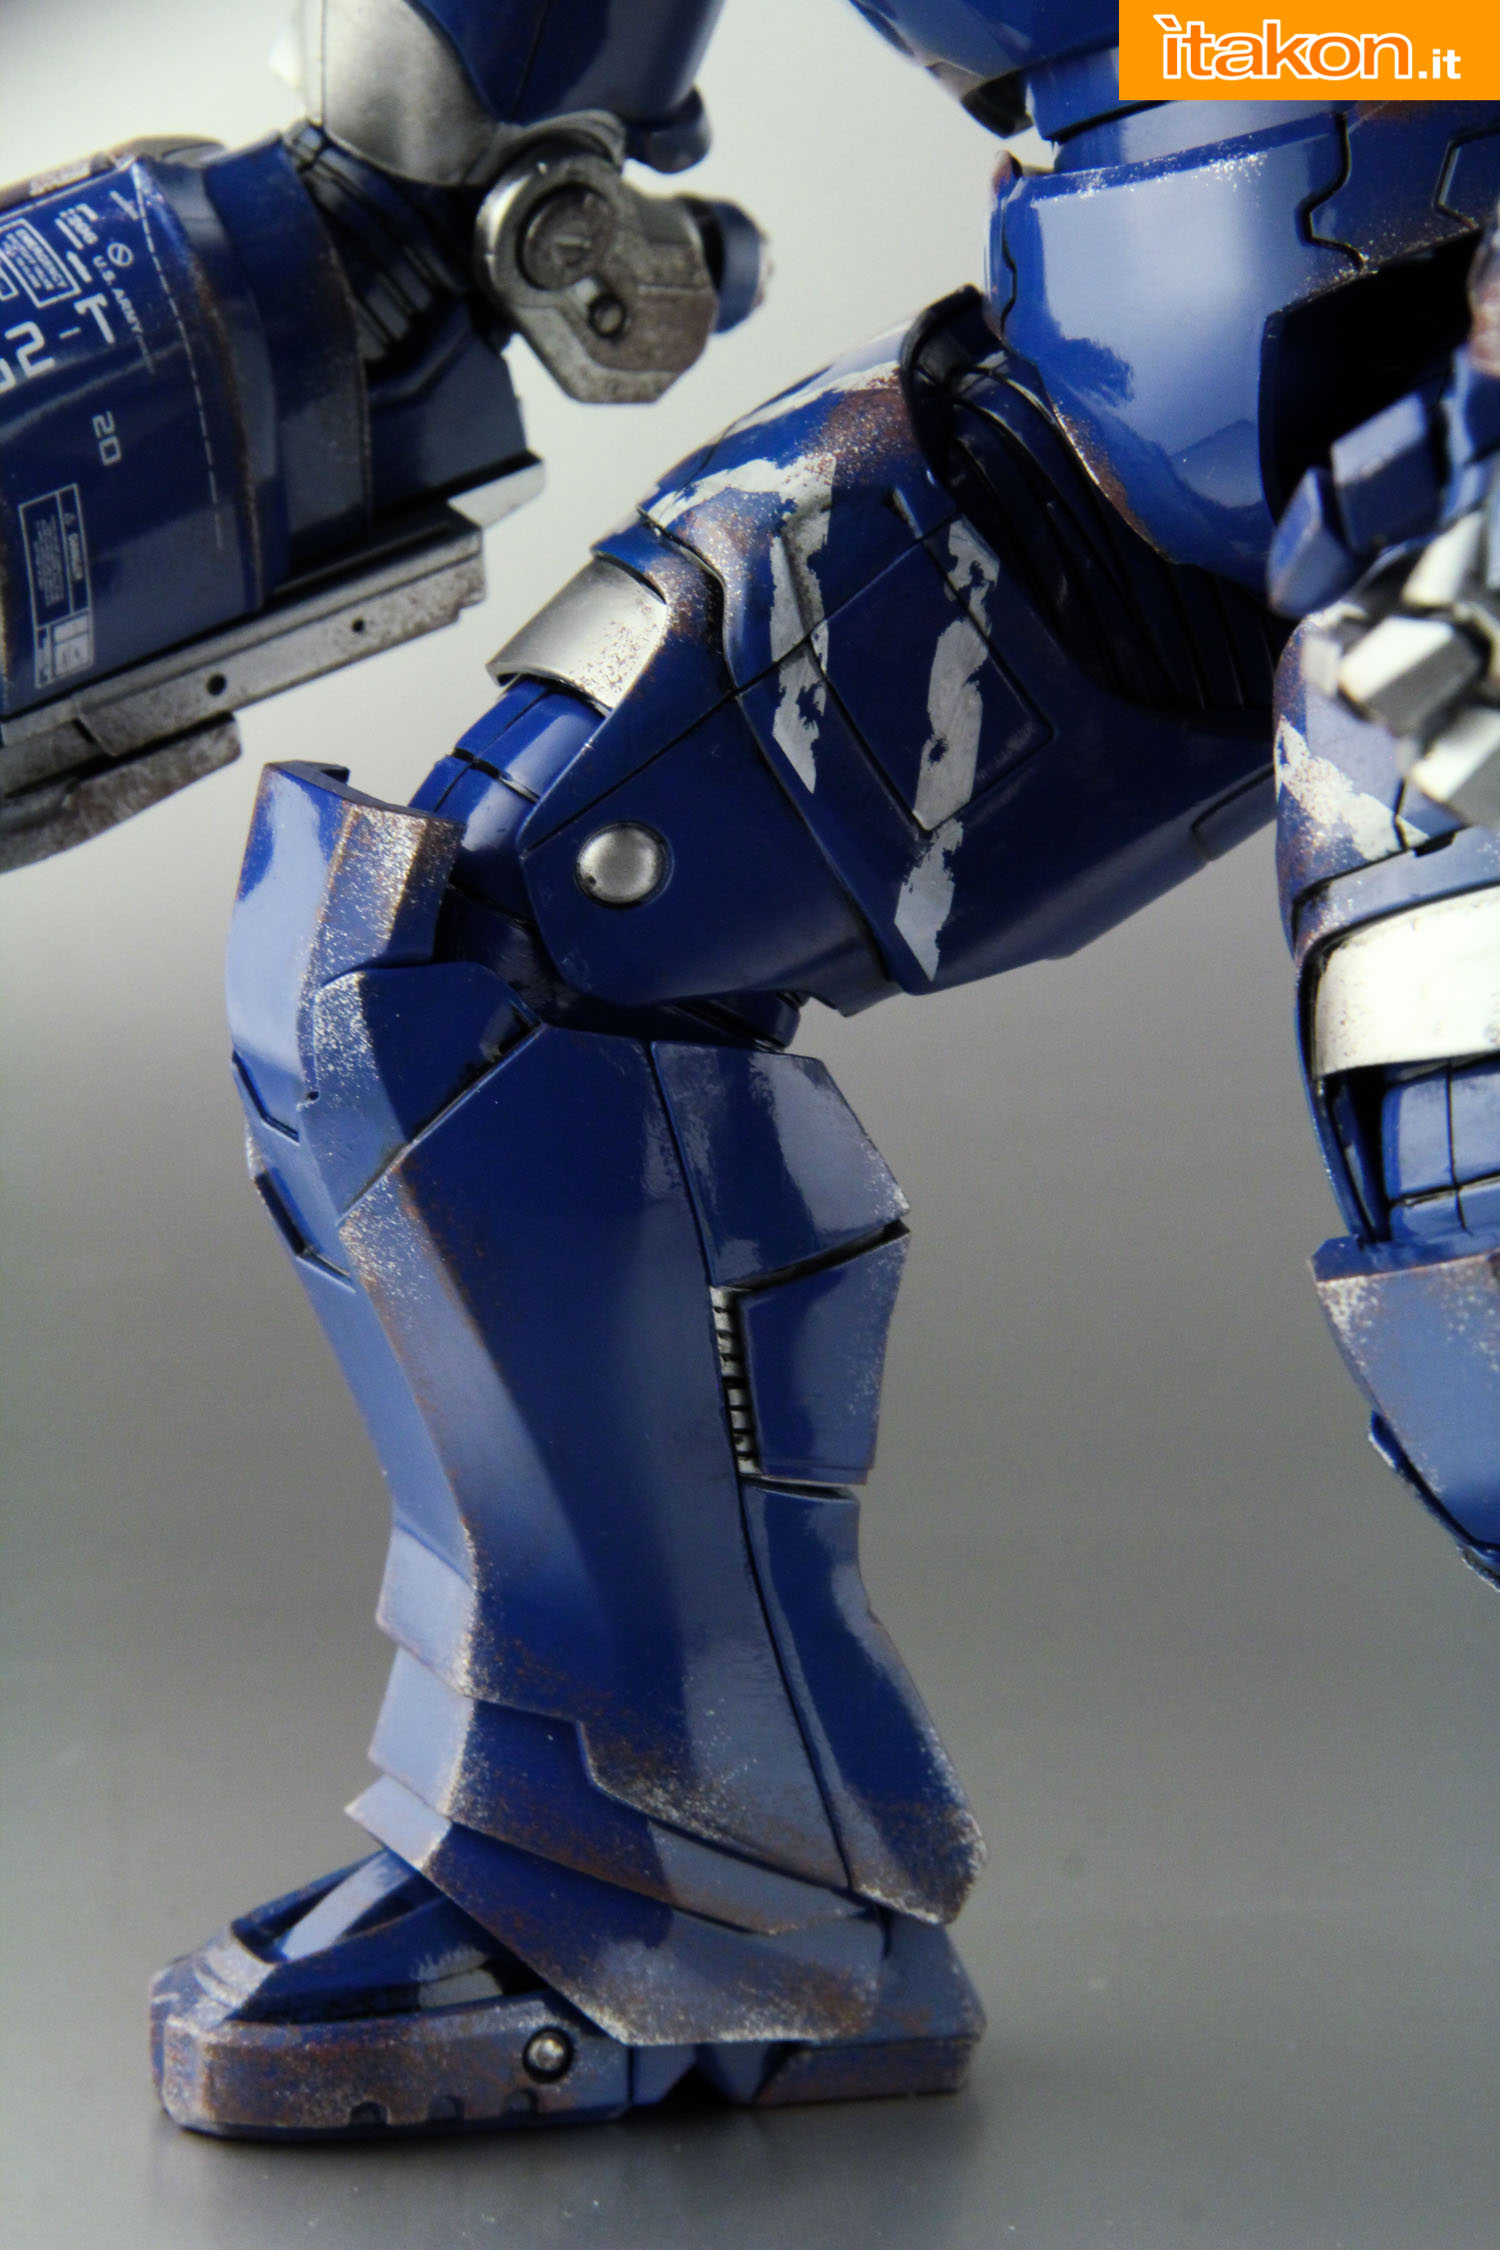 Link a comicave-igor-iron-man-figure-43